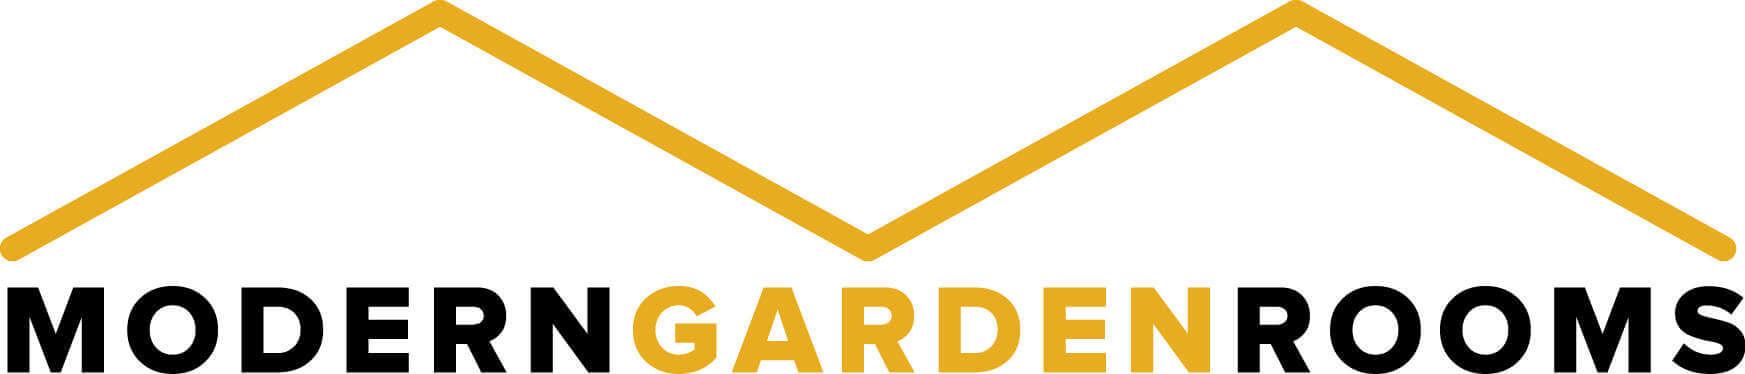 Modern Garden Rooms